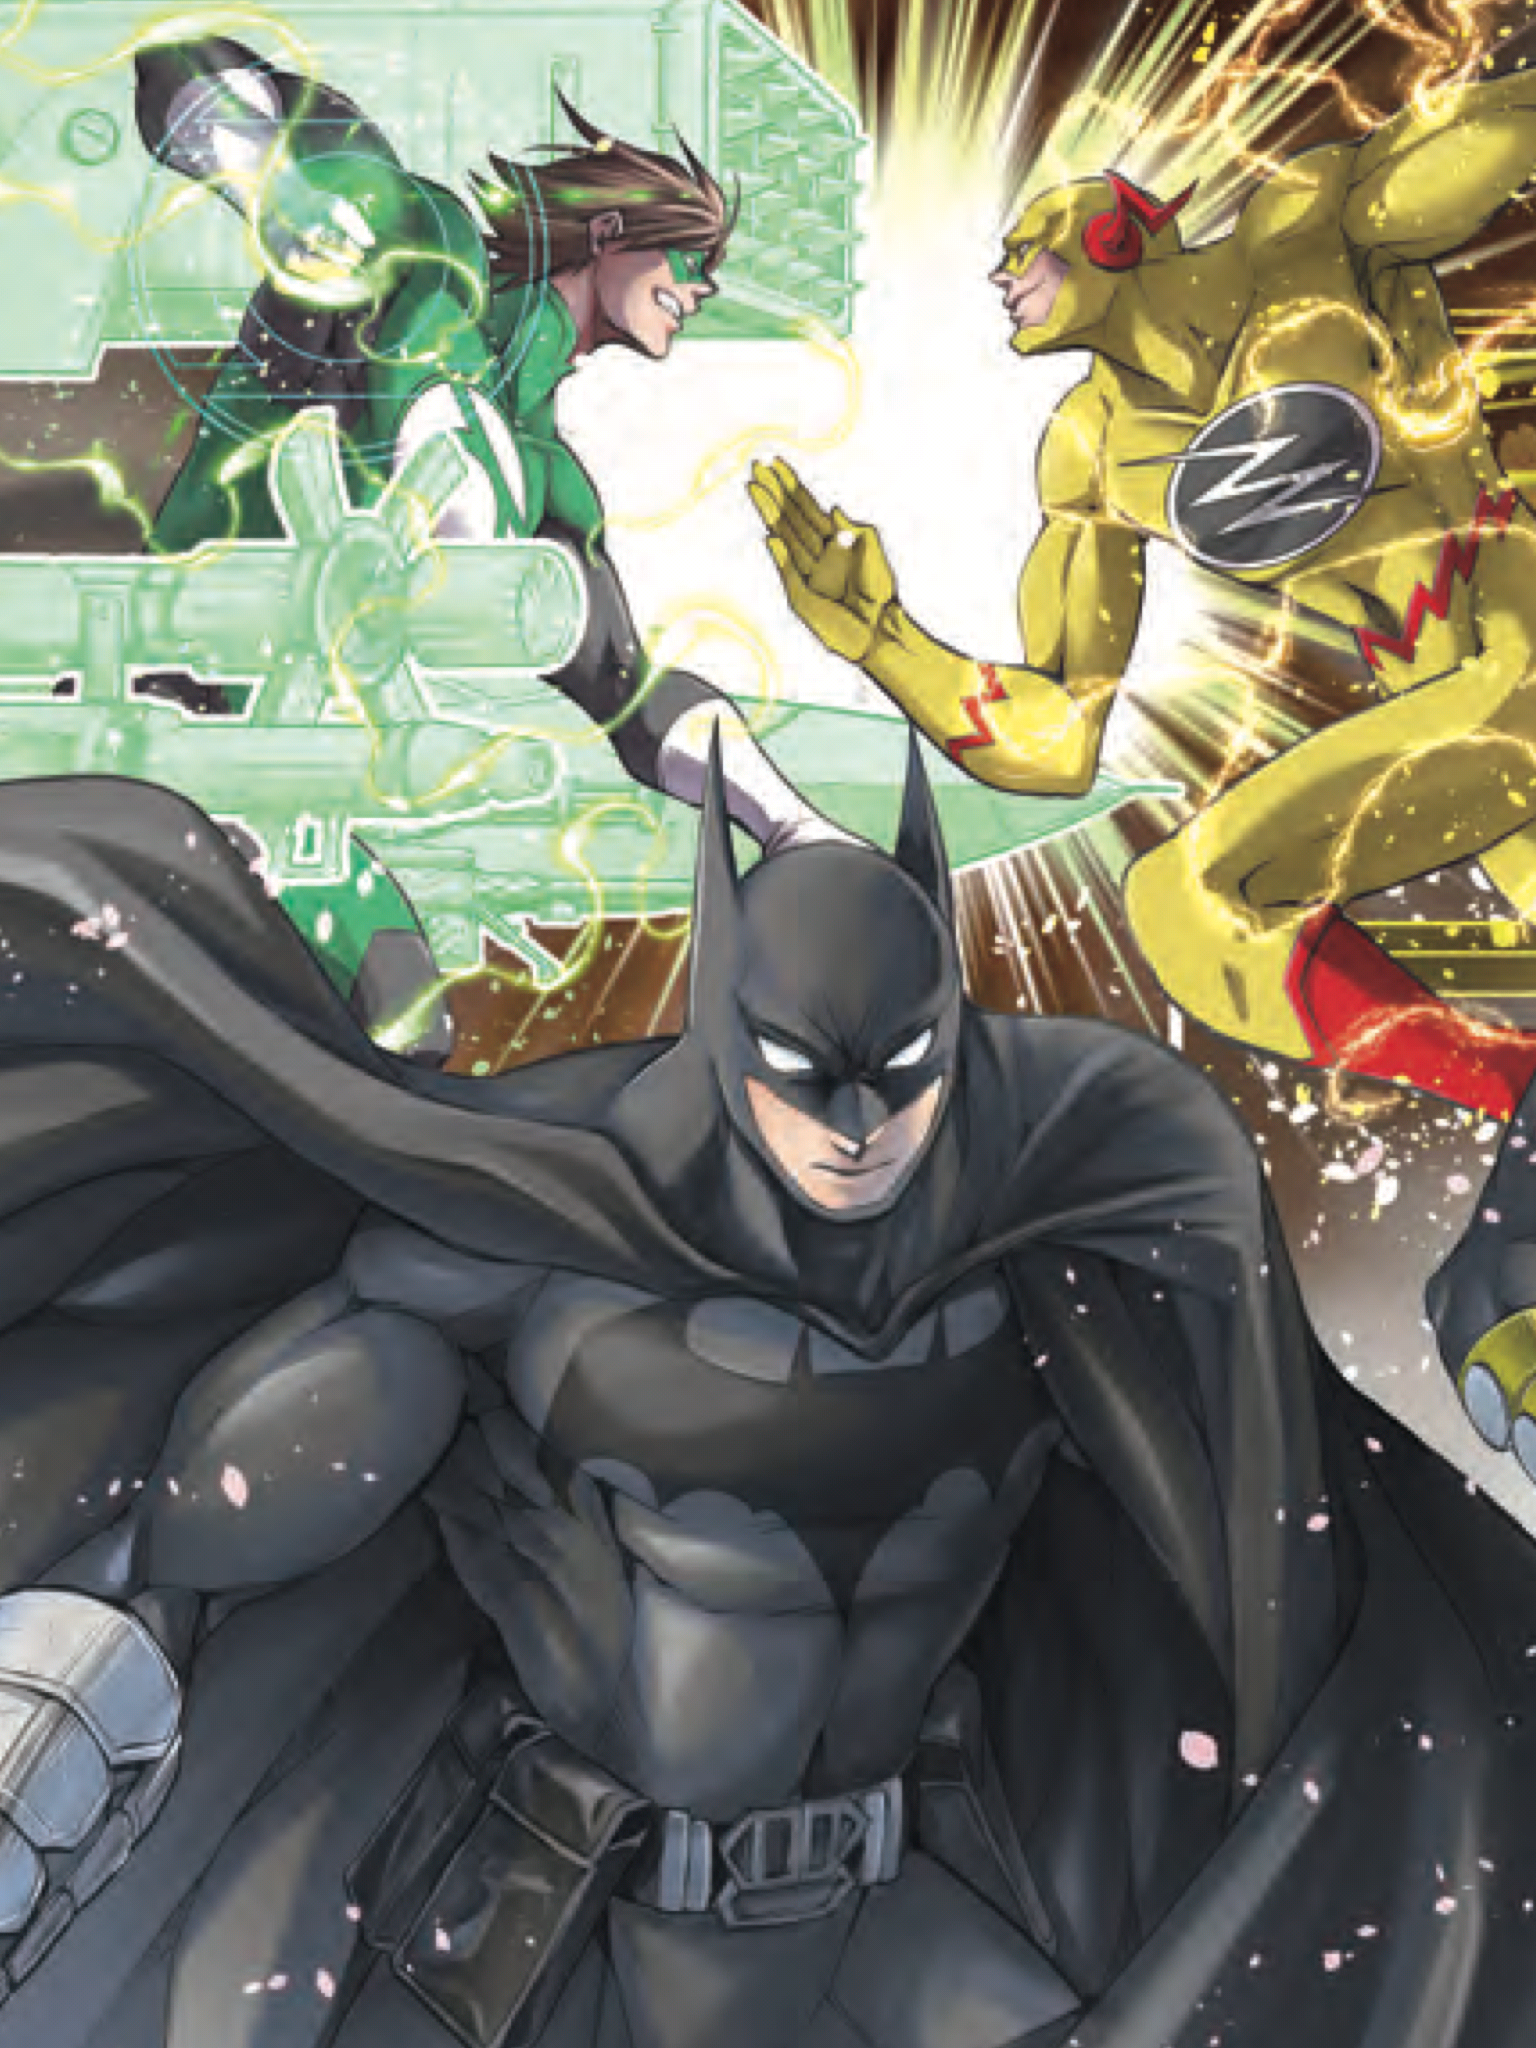 Batman Batman, Green lantern hal jordan, Anime